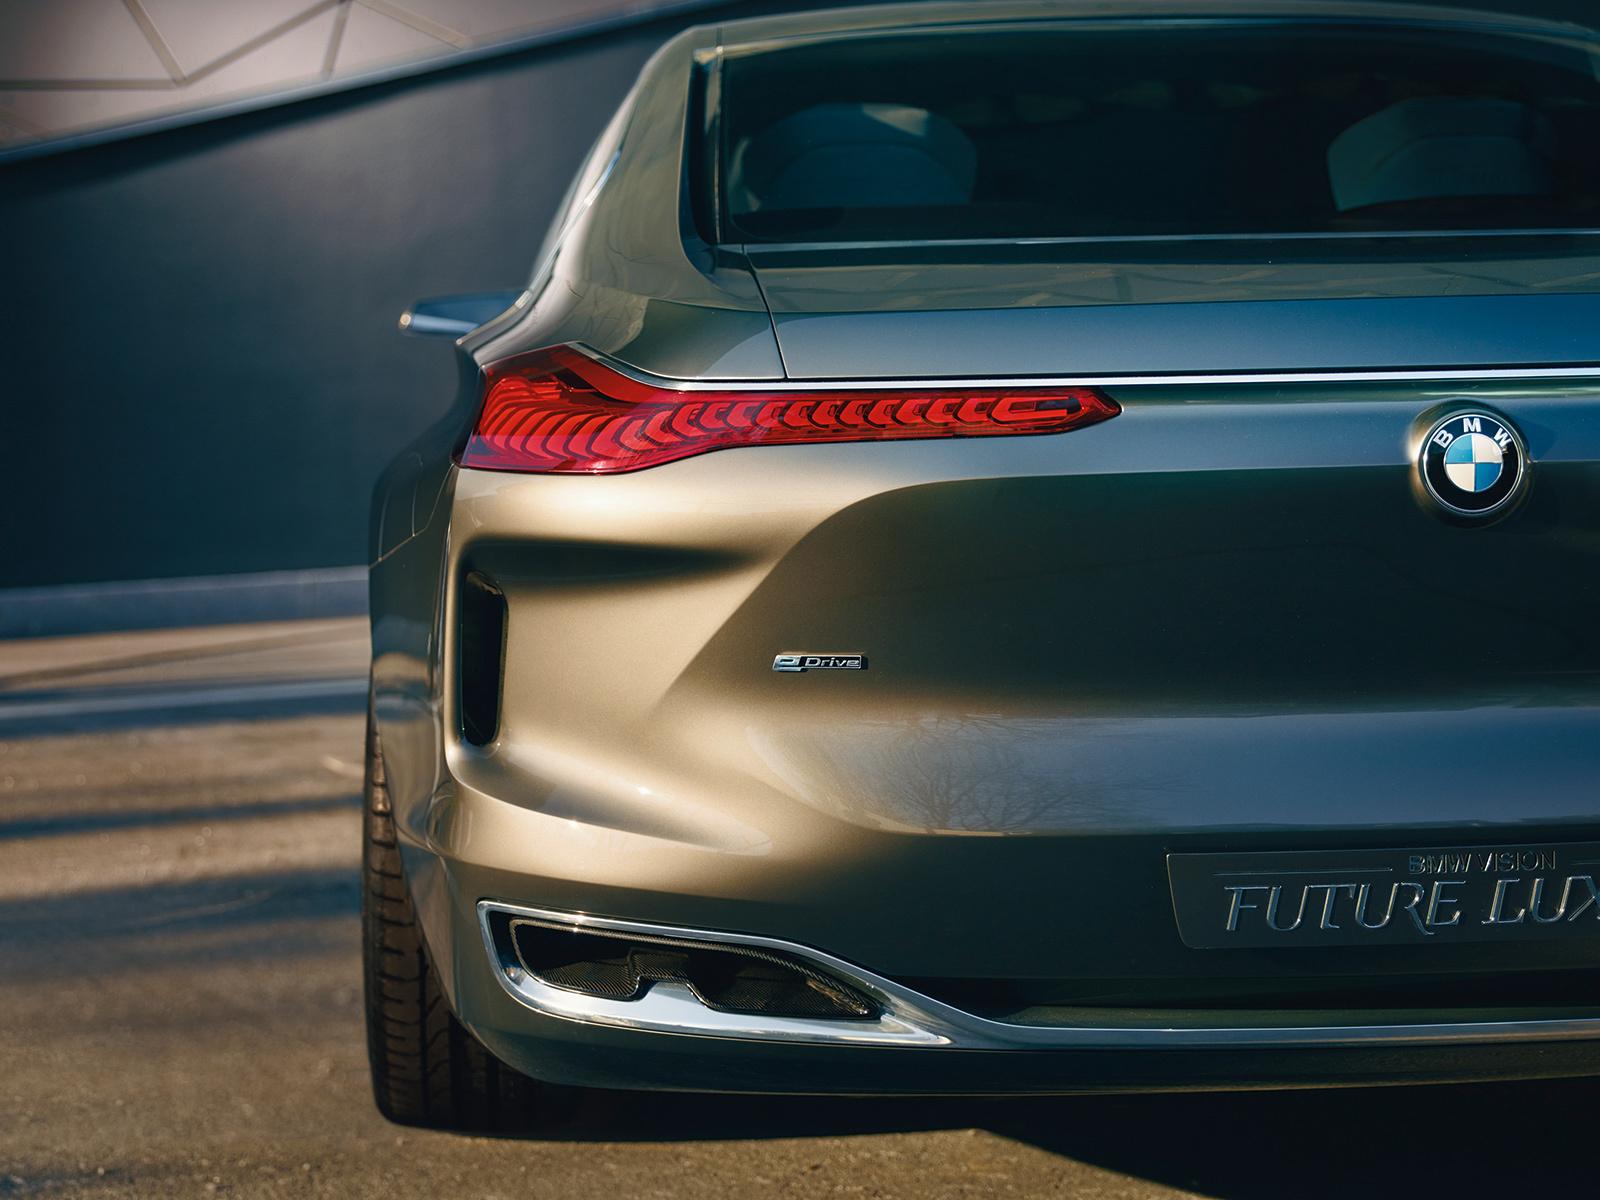 BMW Vision Future Luxury HD Wallpaper